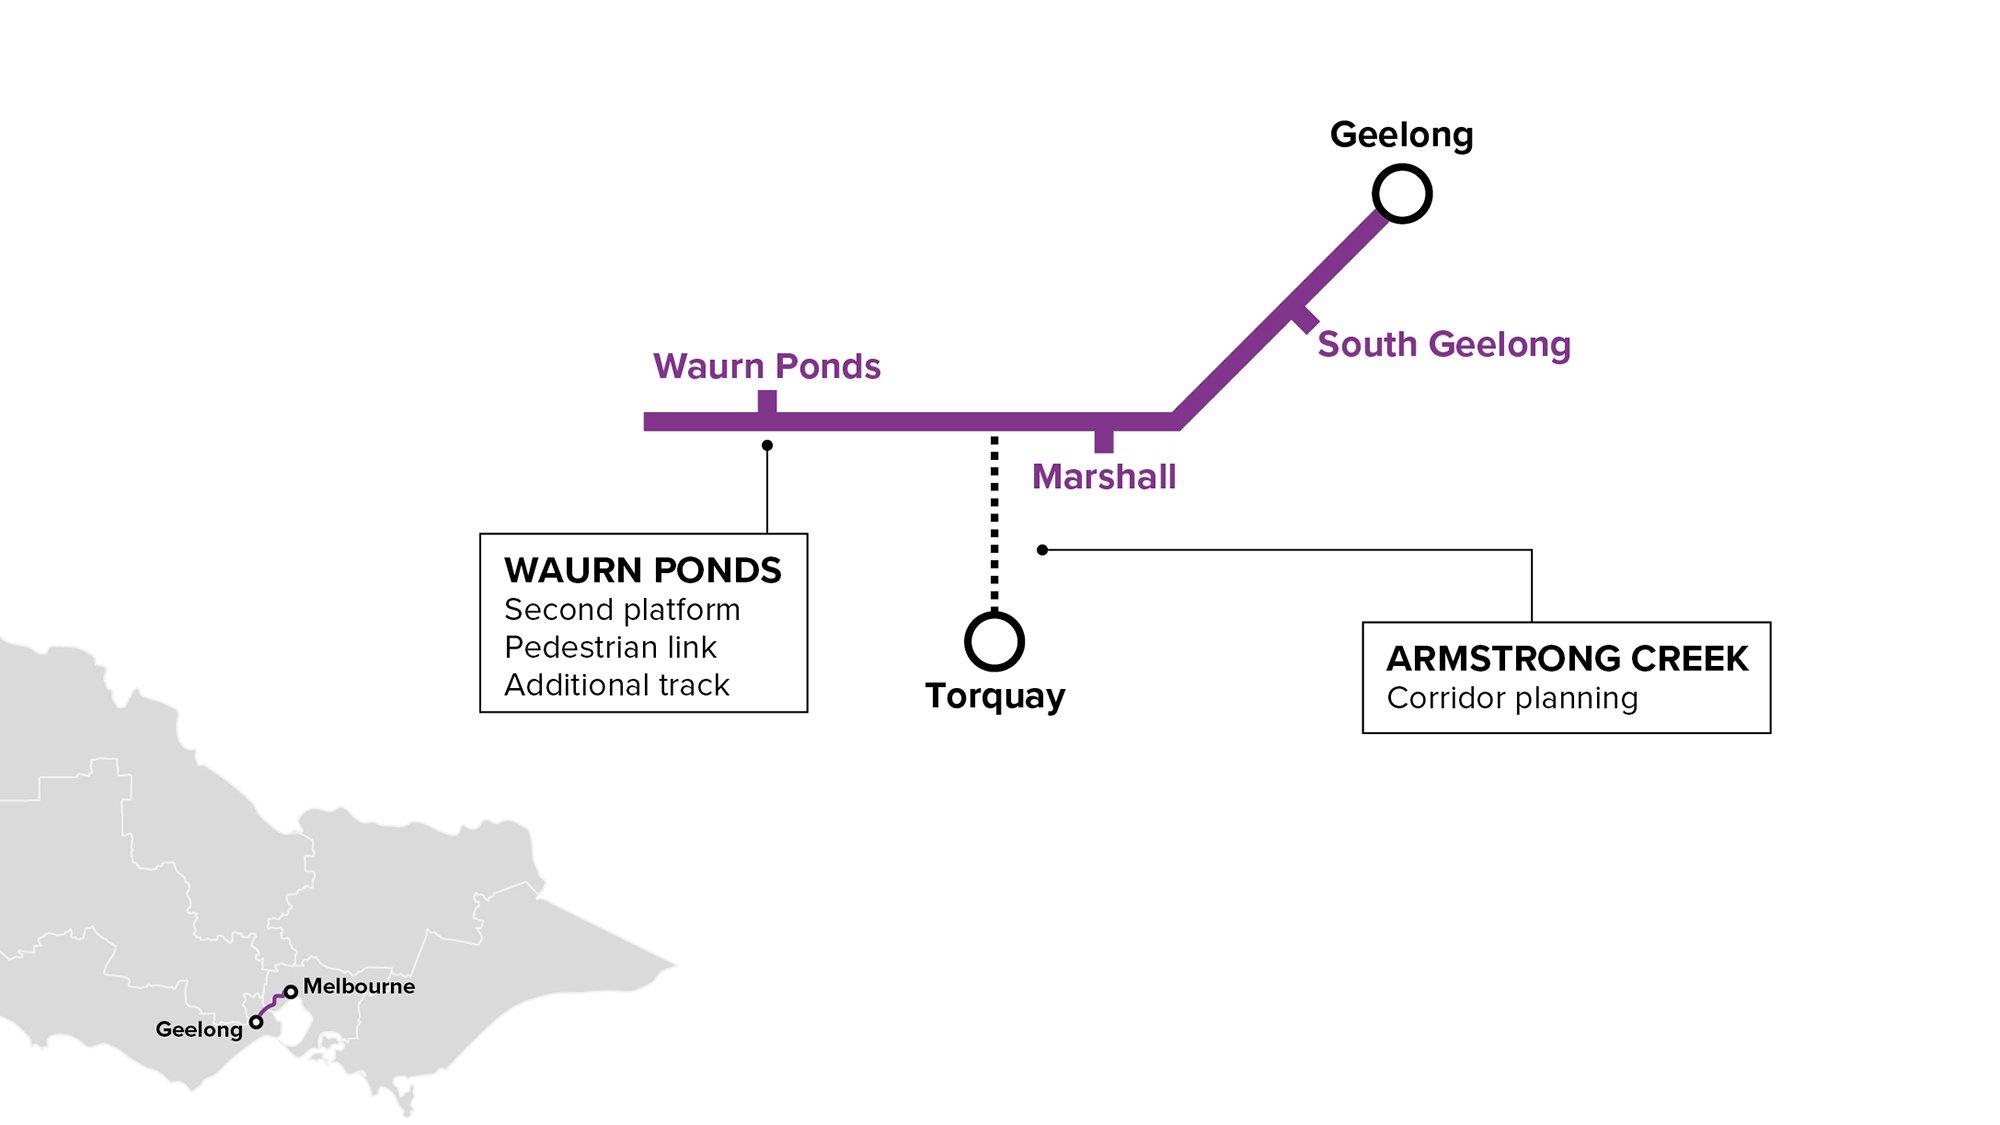 RRR-Geelong-Line-Map-Works-A4-Factsheet-v2-01